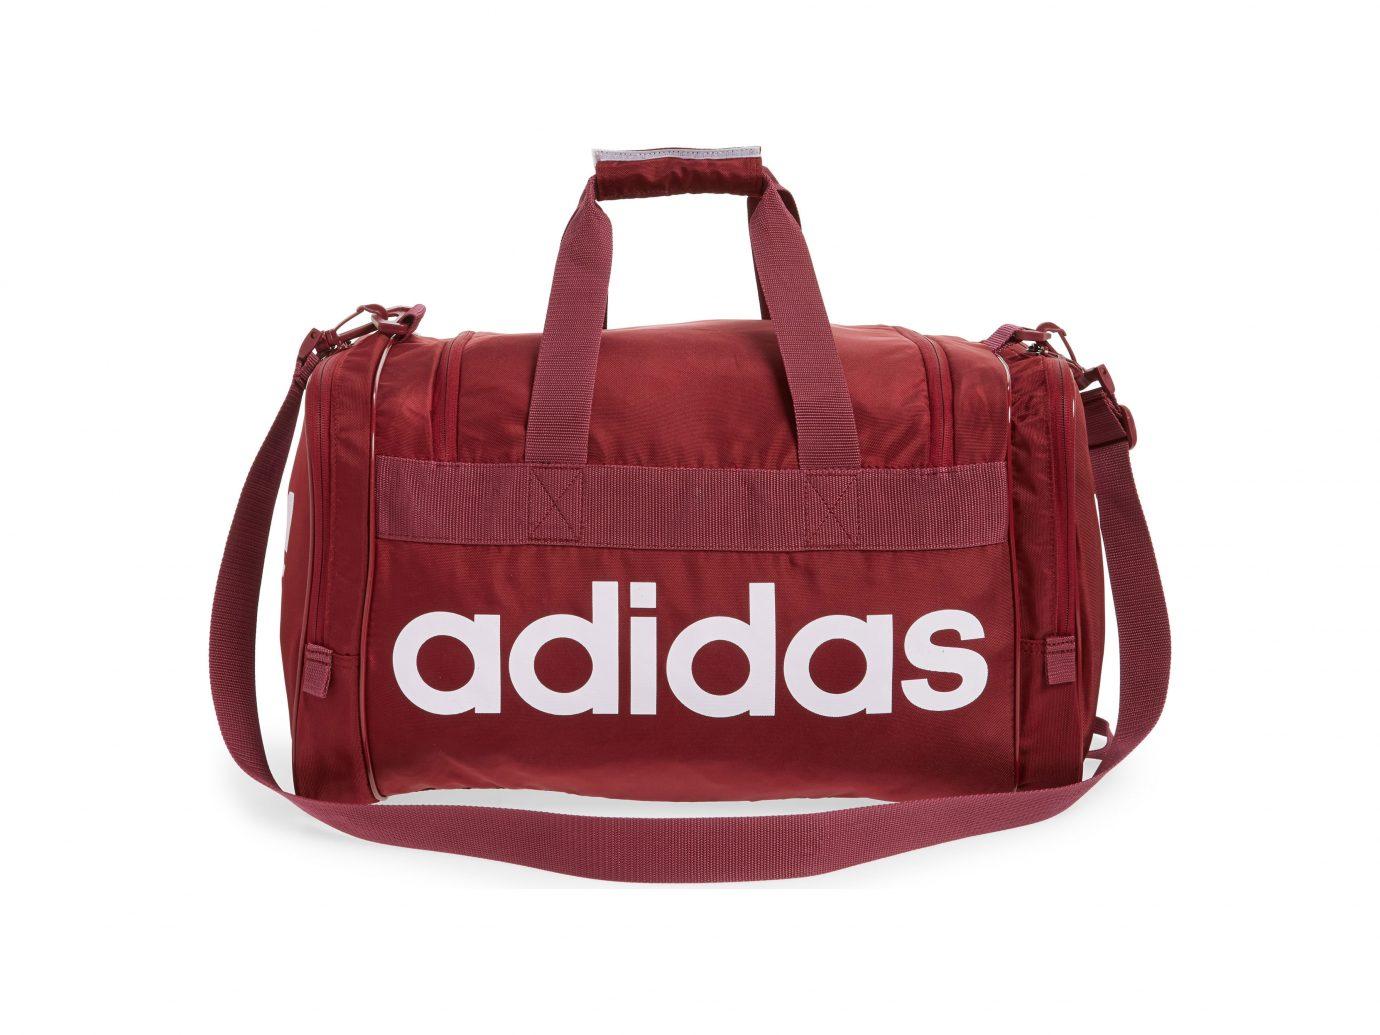 Adidas Original Santiago Duffel Bag